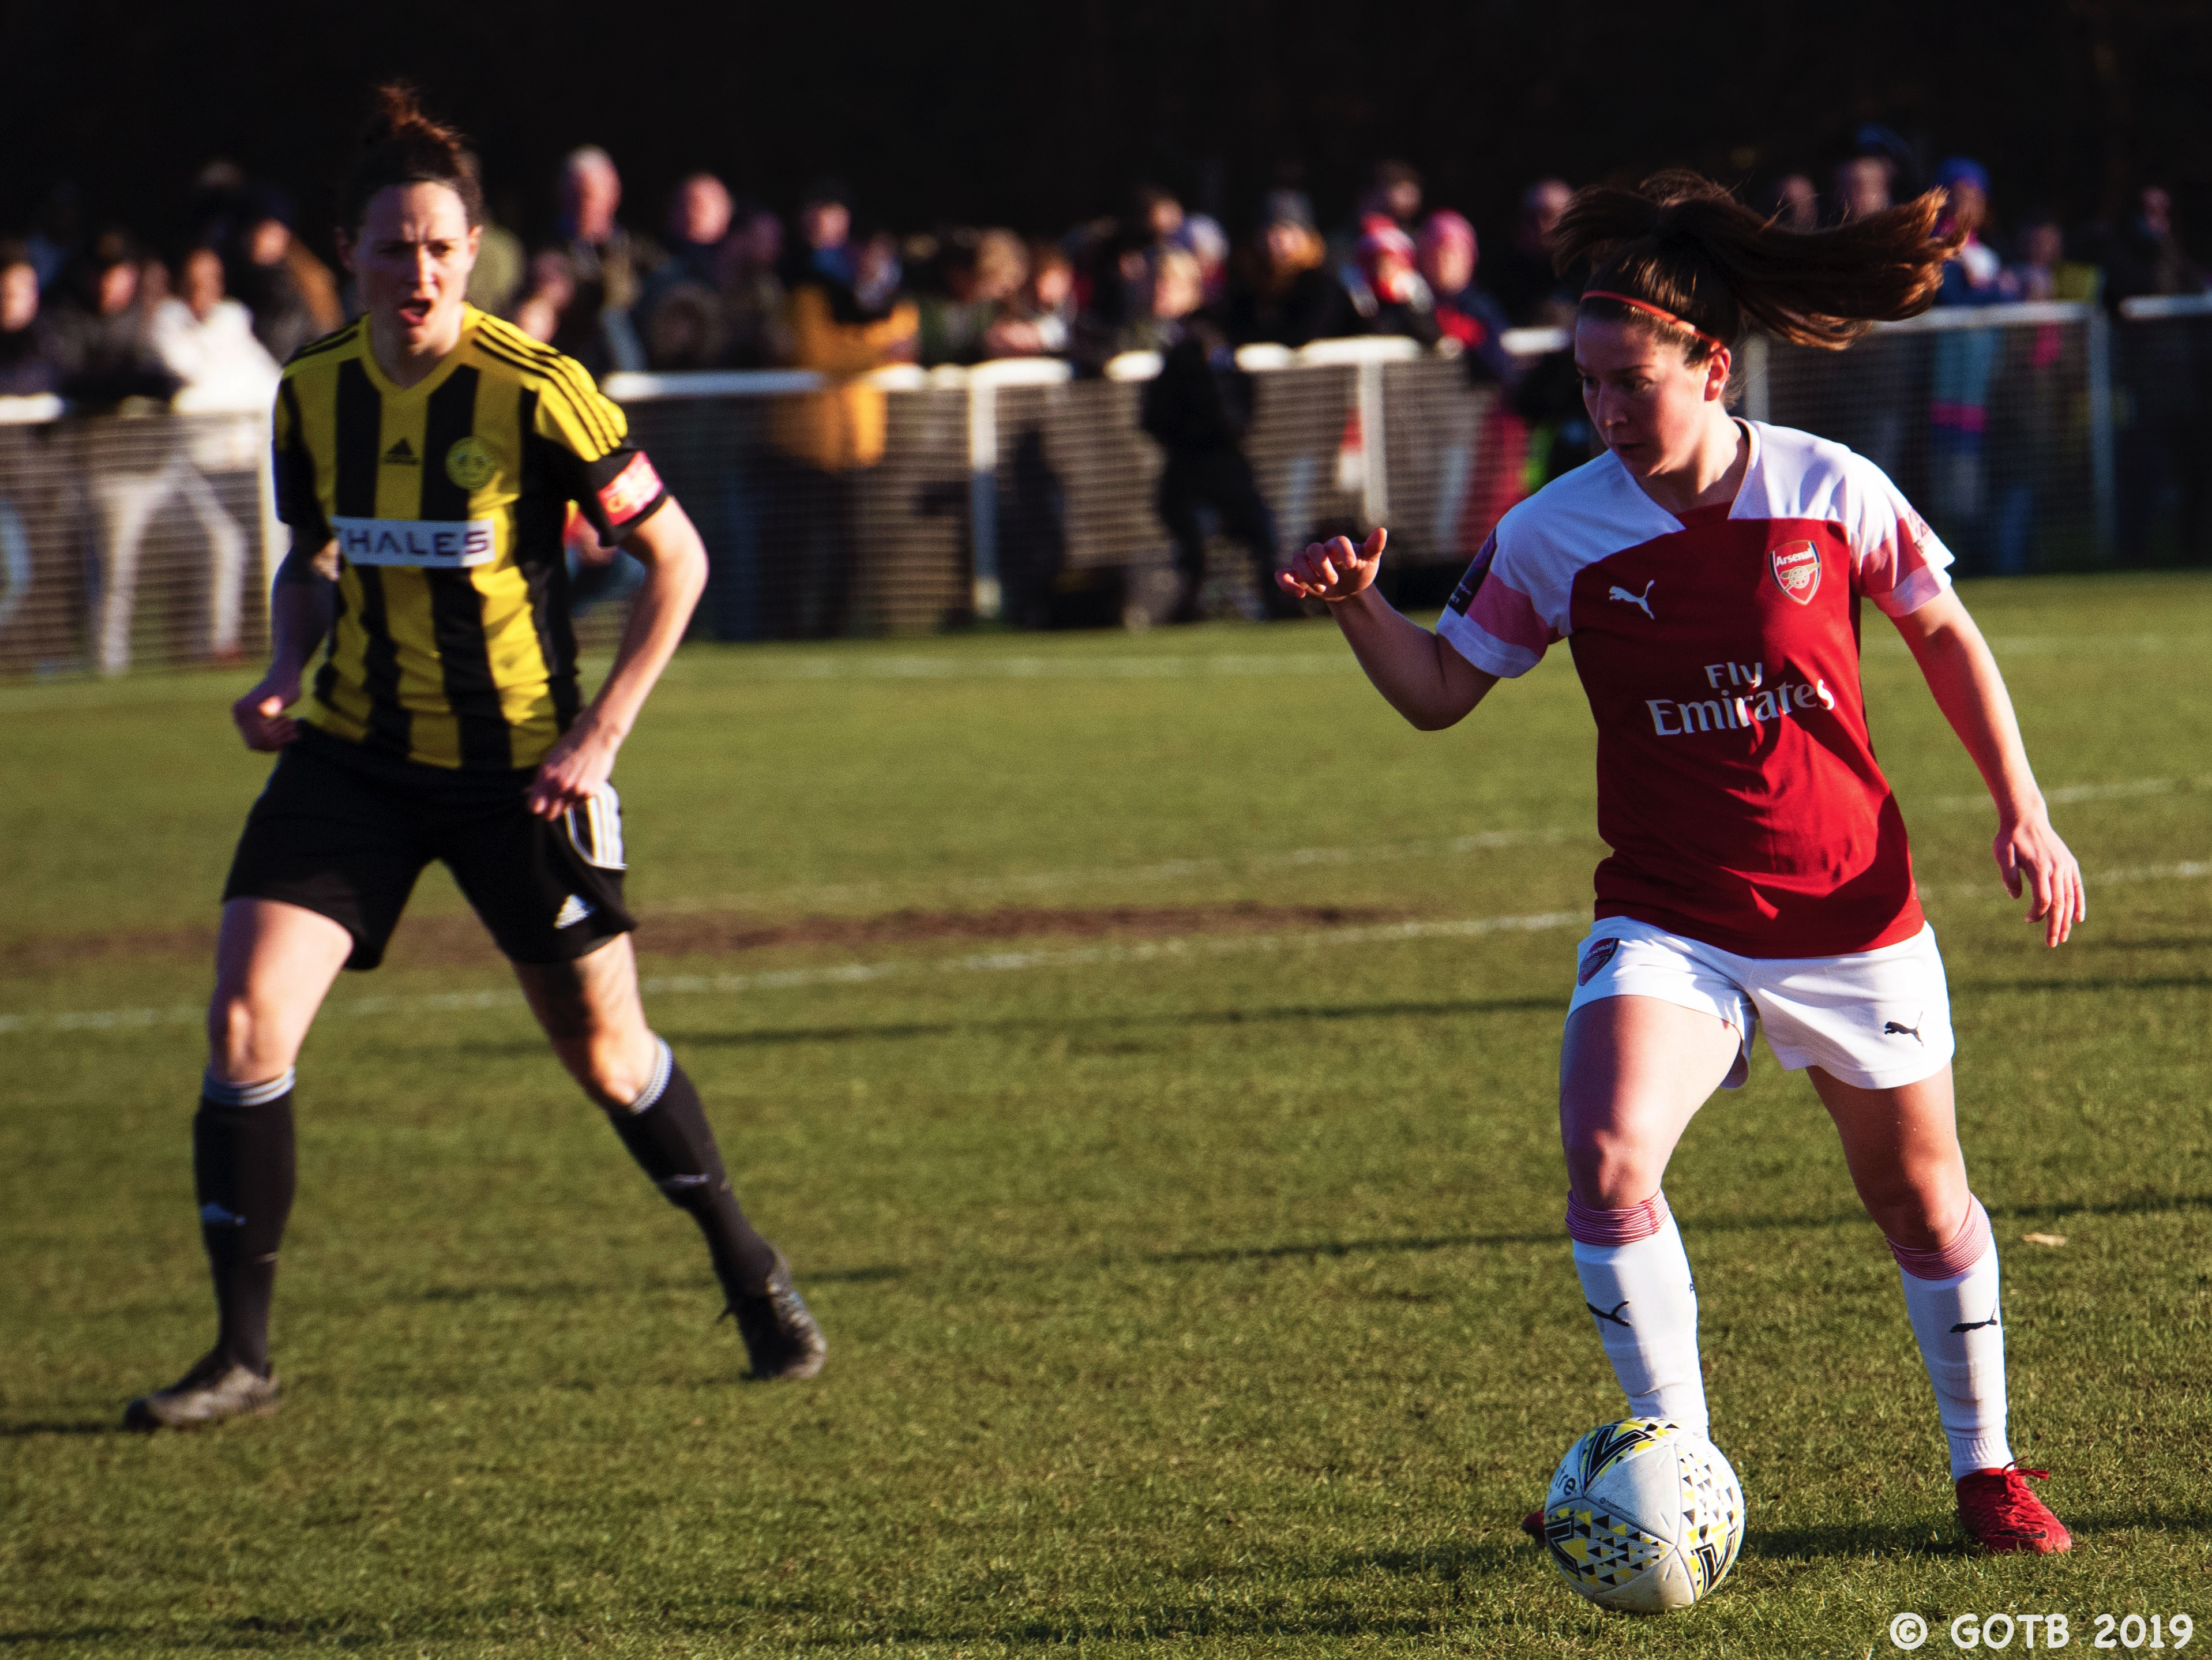 Crawley Wasps v Arsenal, FA Cup 4th Round